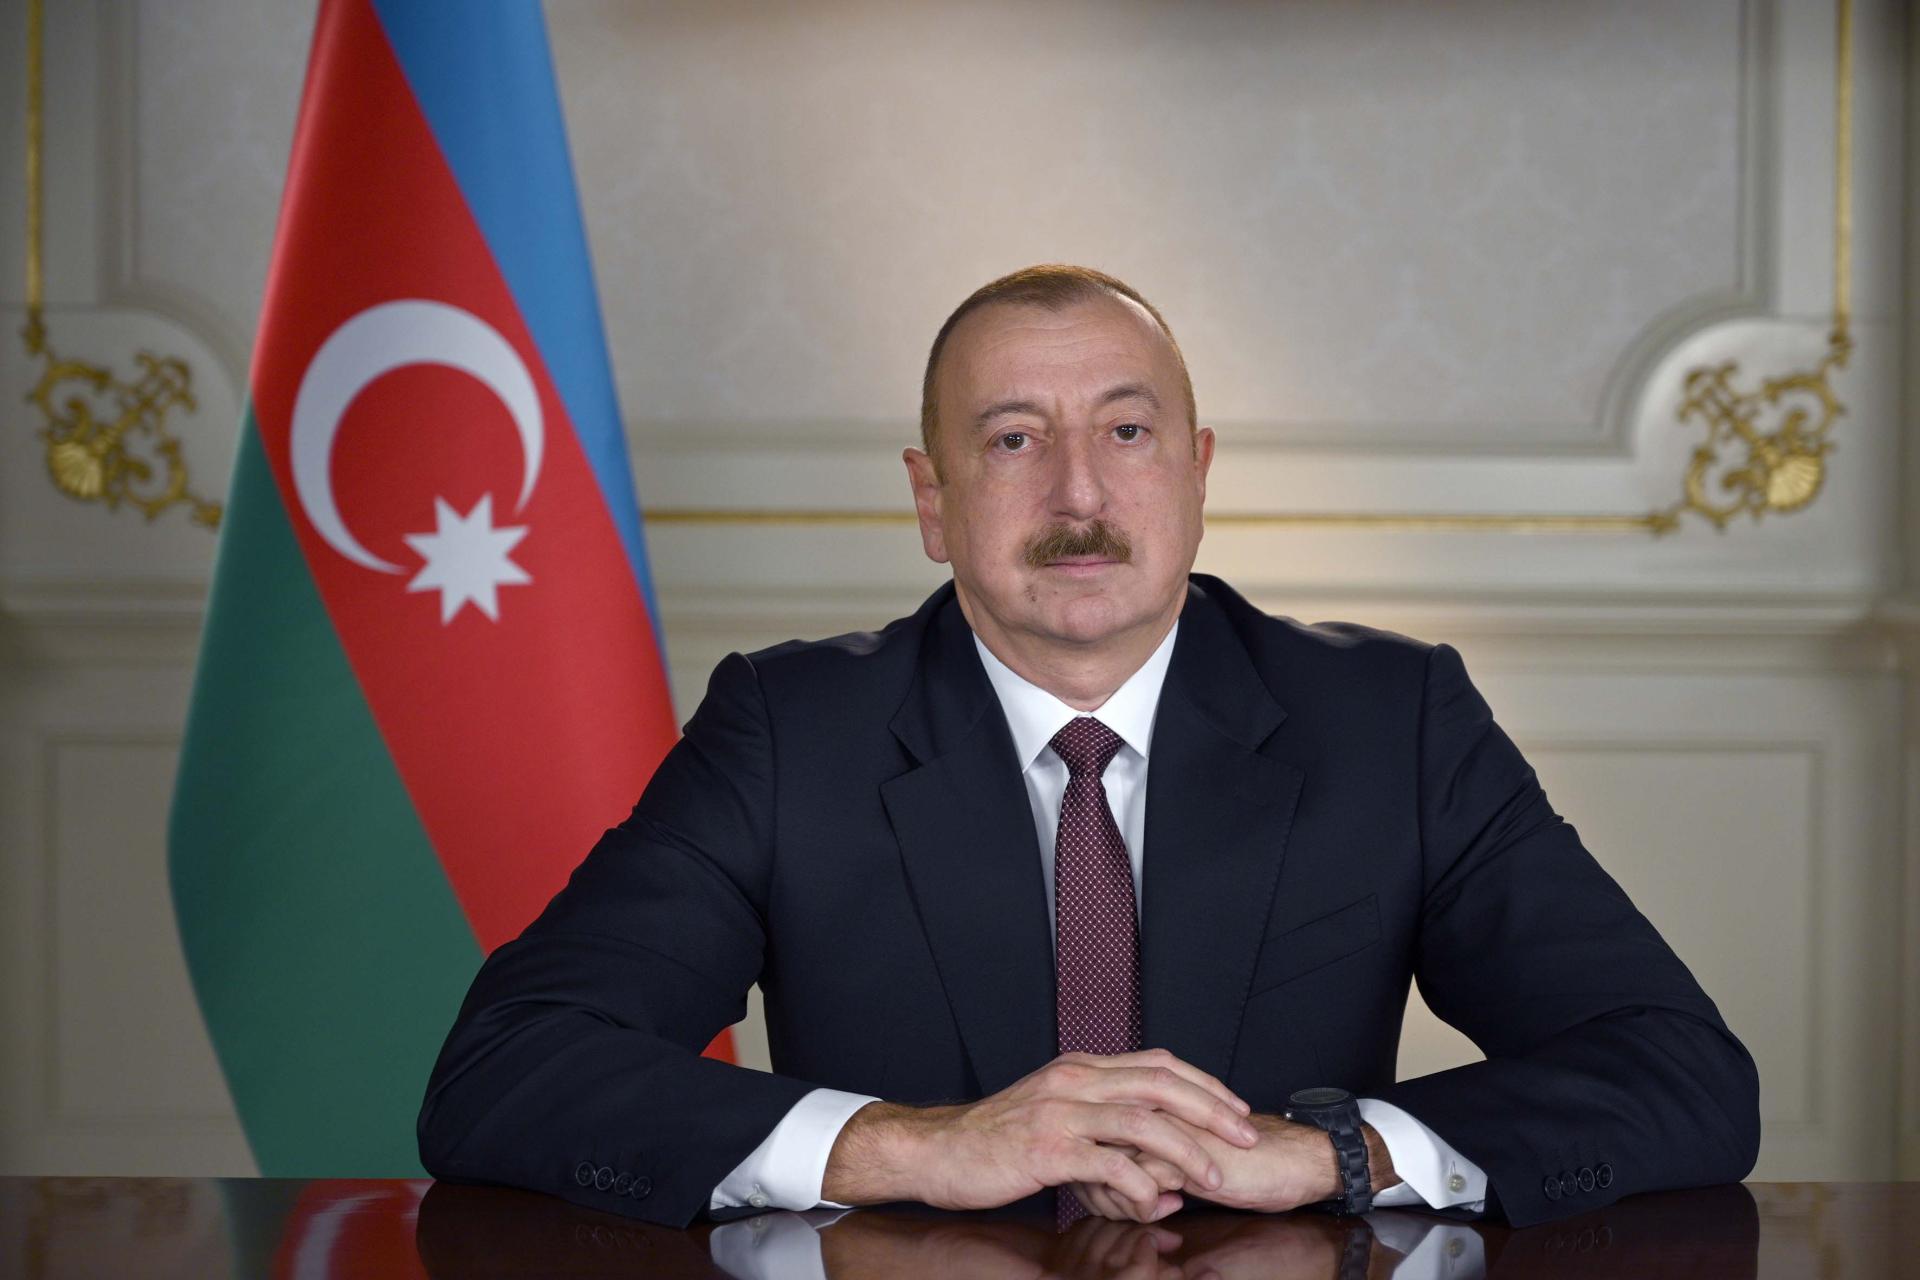 2020/02/ilham_aliyev_main_new_president_310120_1_1581428517.jpg